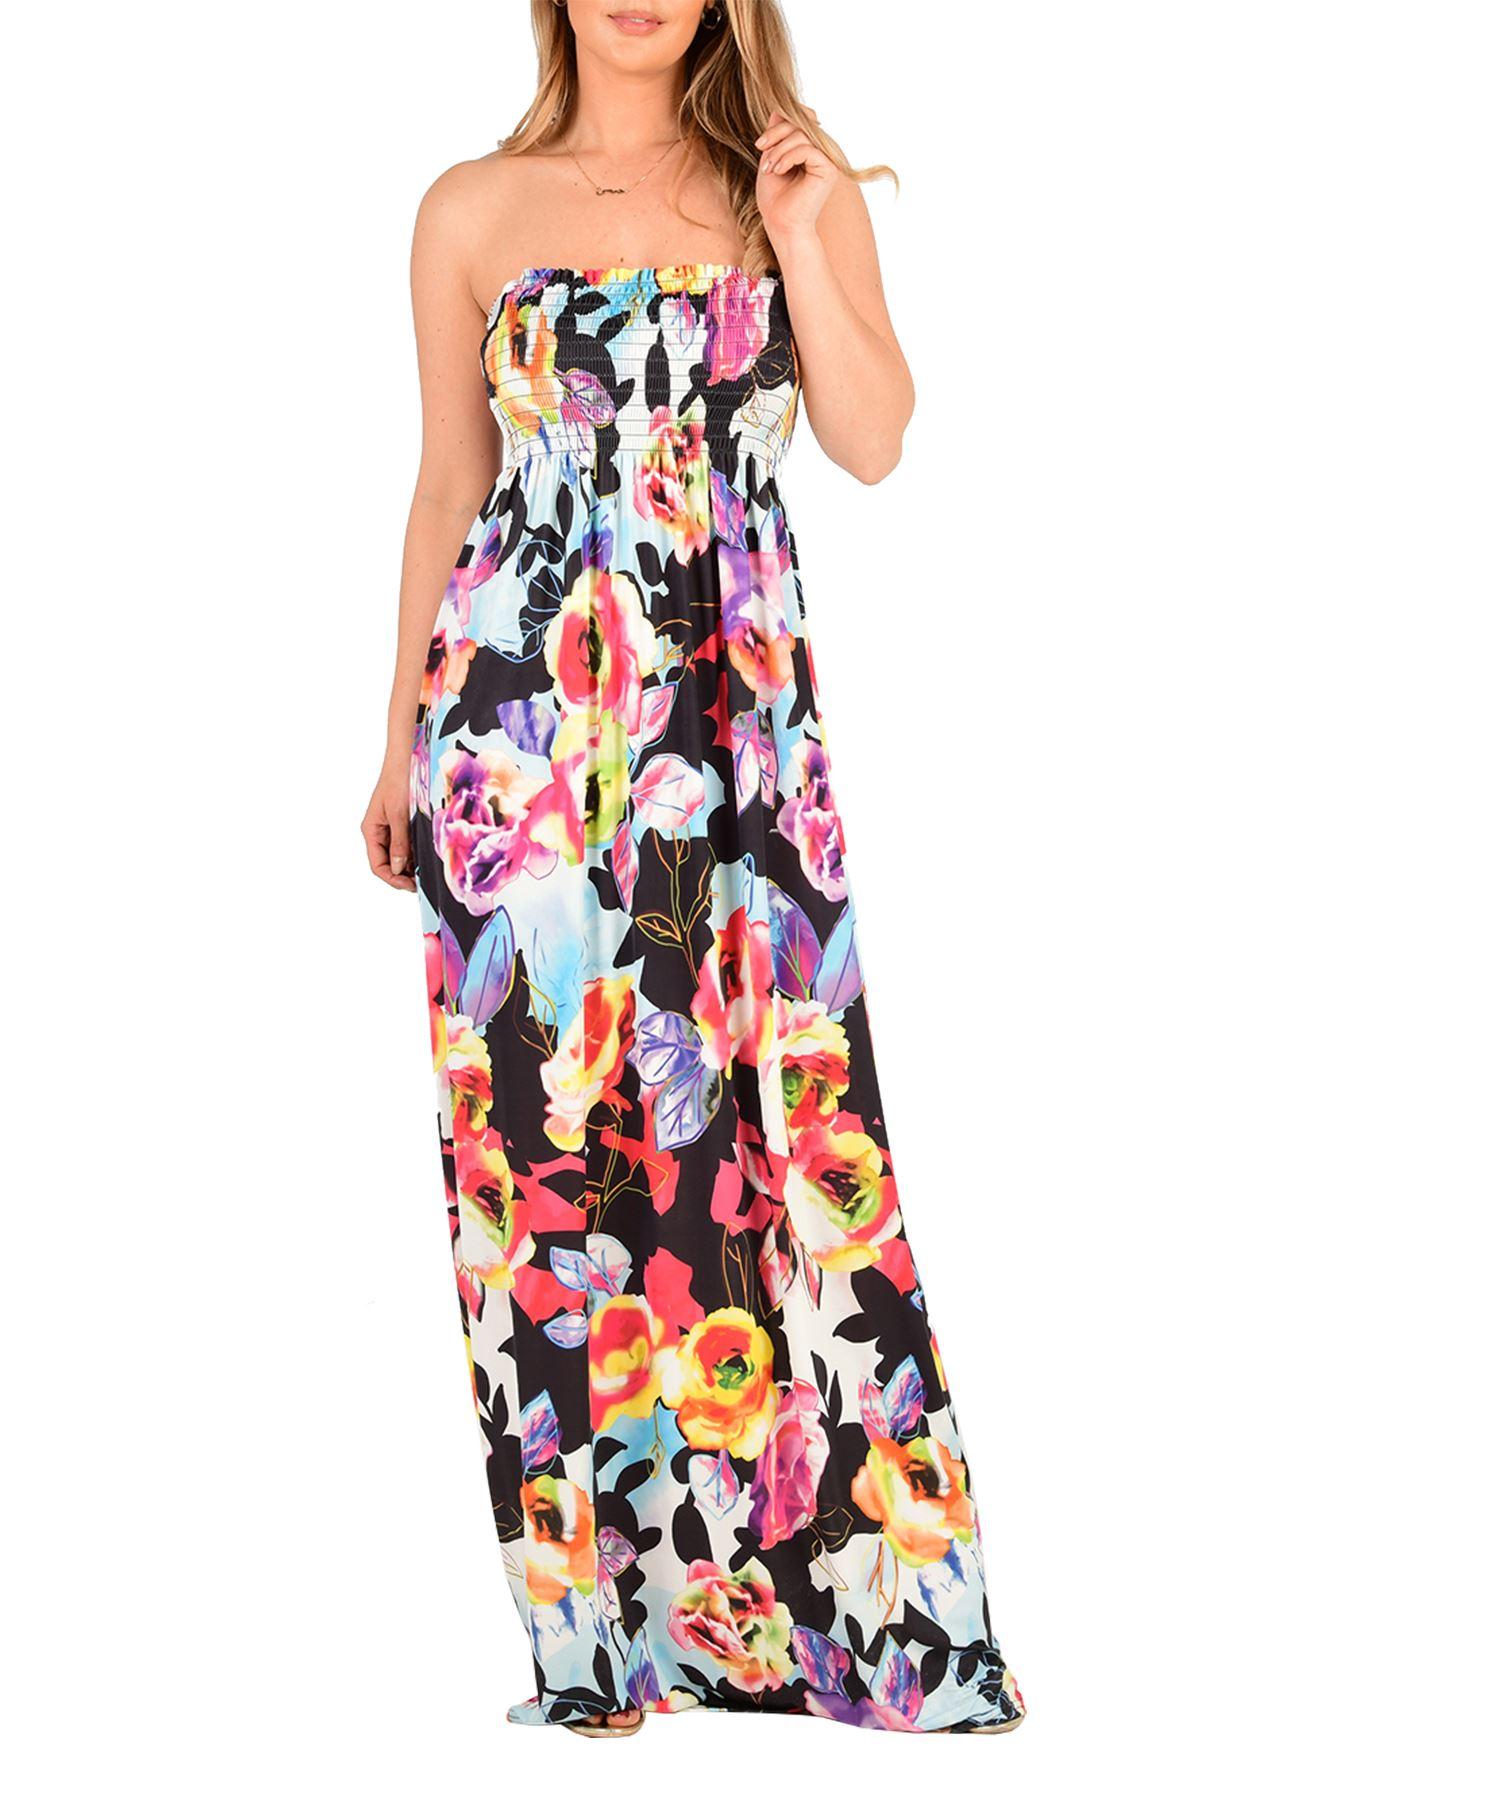 8280371ef87 New Floral Boob Tube Bandeau Ladies Summer Sheering Dress Top UK 8 ...